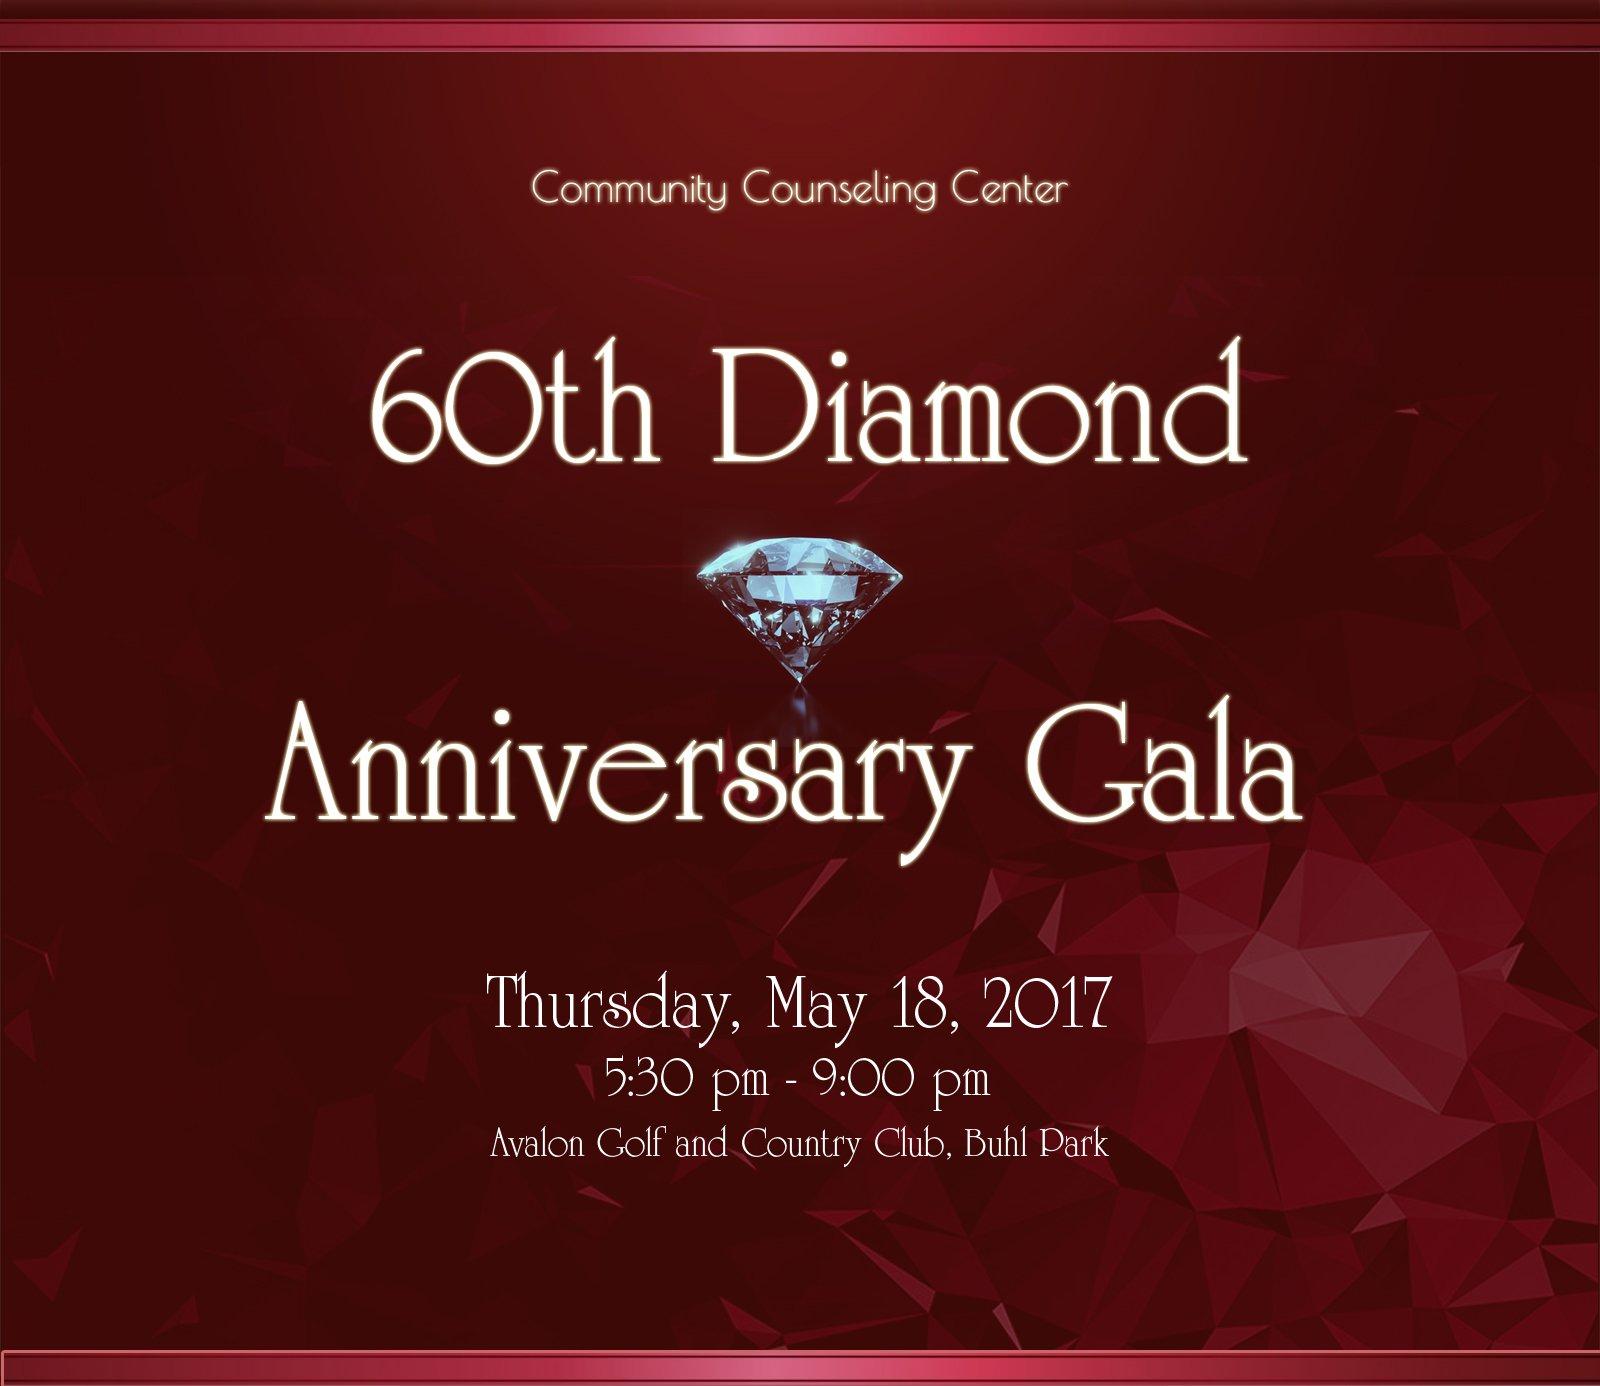 Auction, Gala, diamond, anniversary, Auction